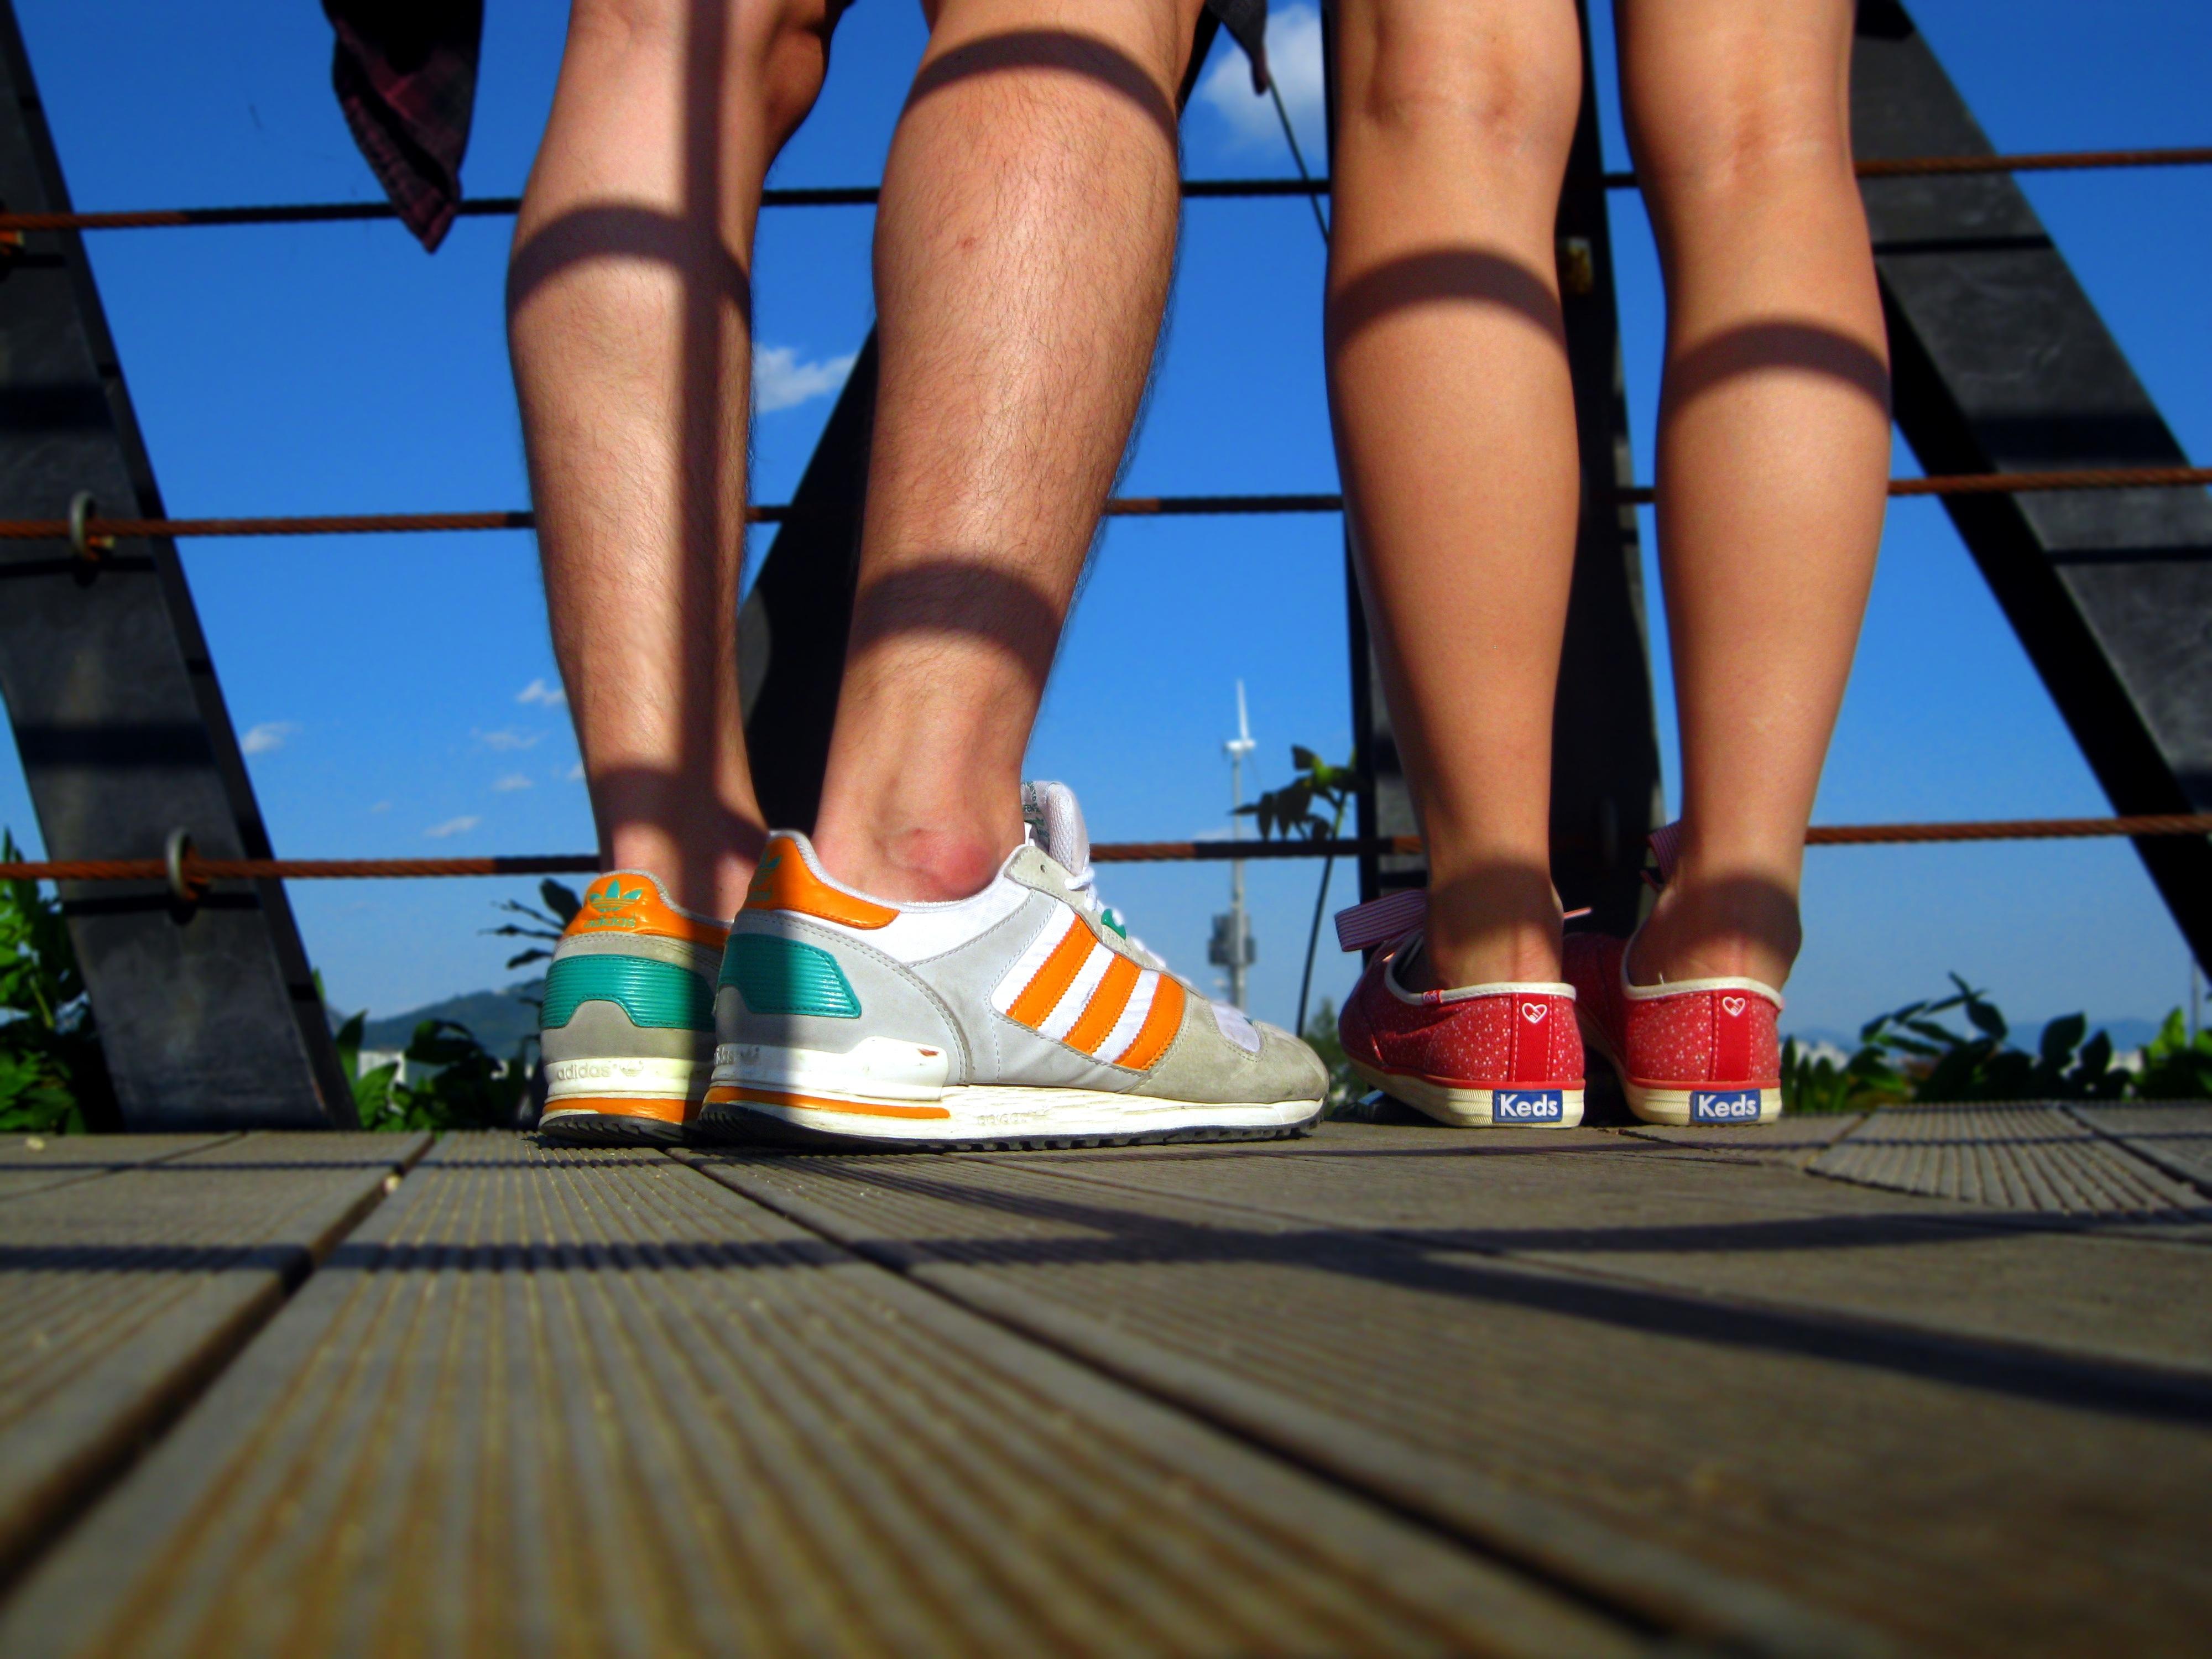 Free Images : shoe, feet, leg, human body, shoes ...